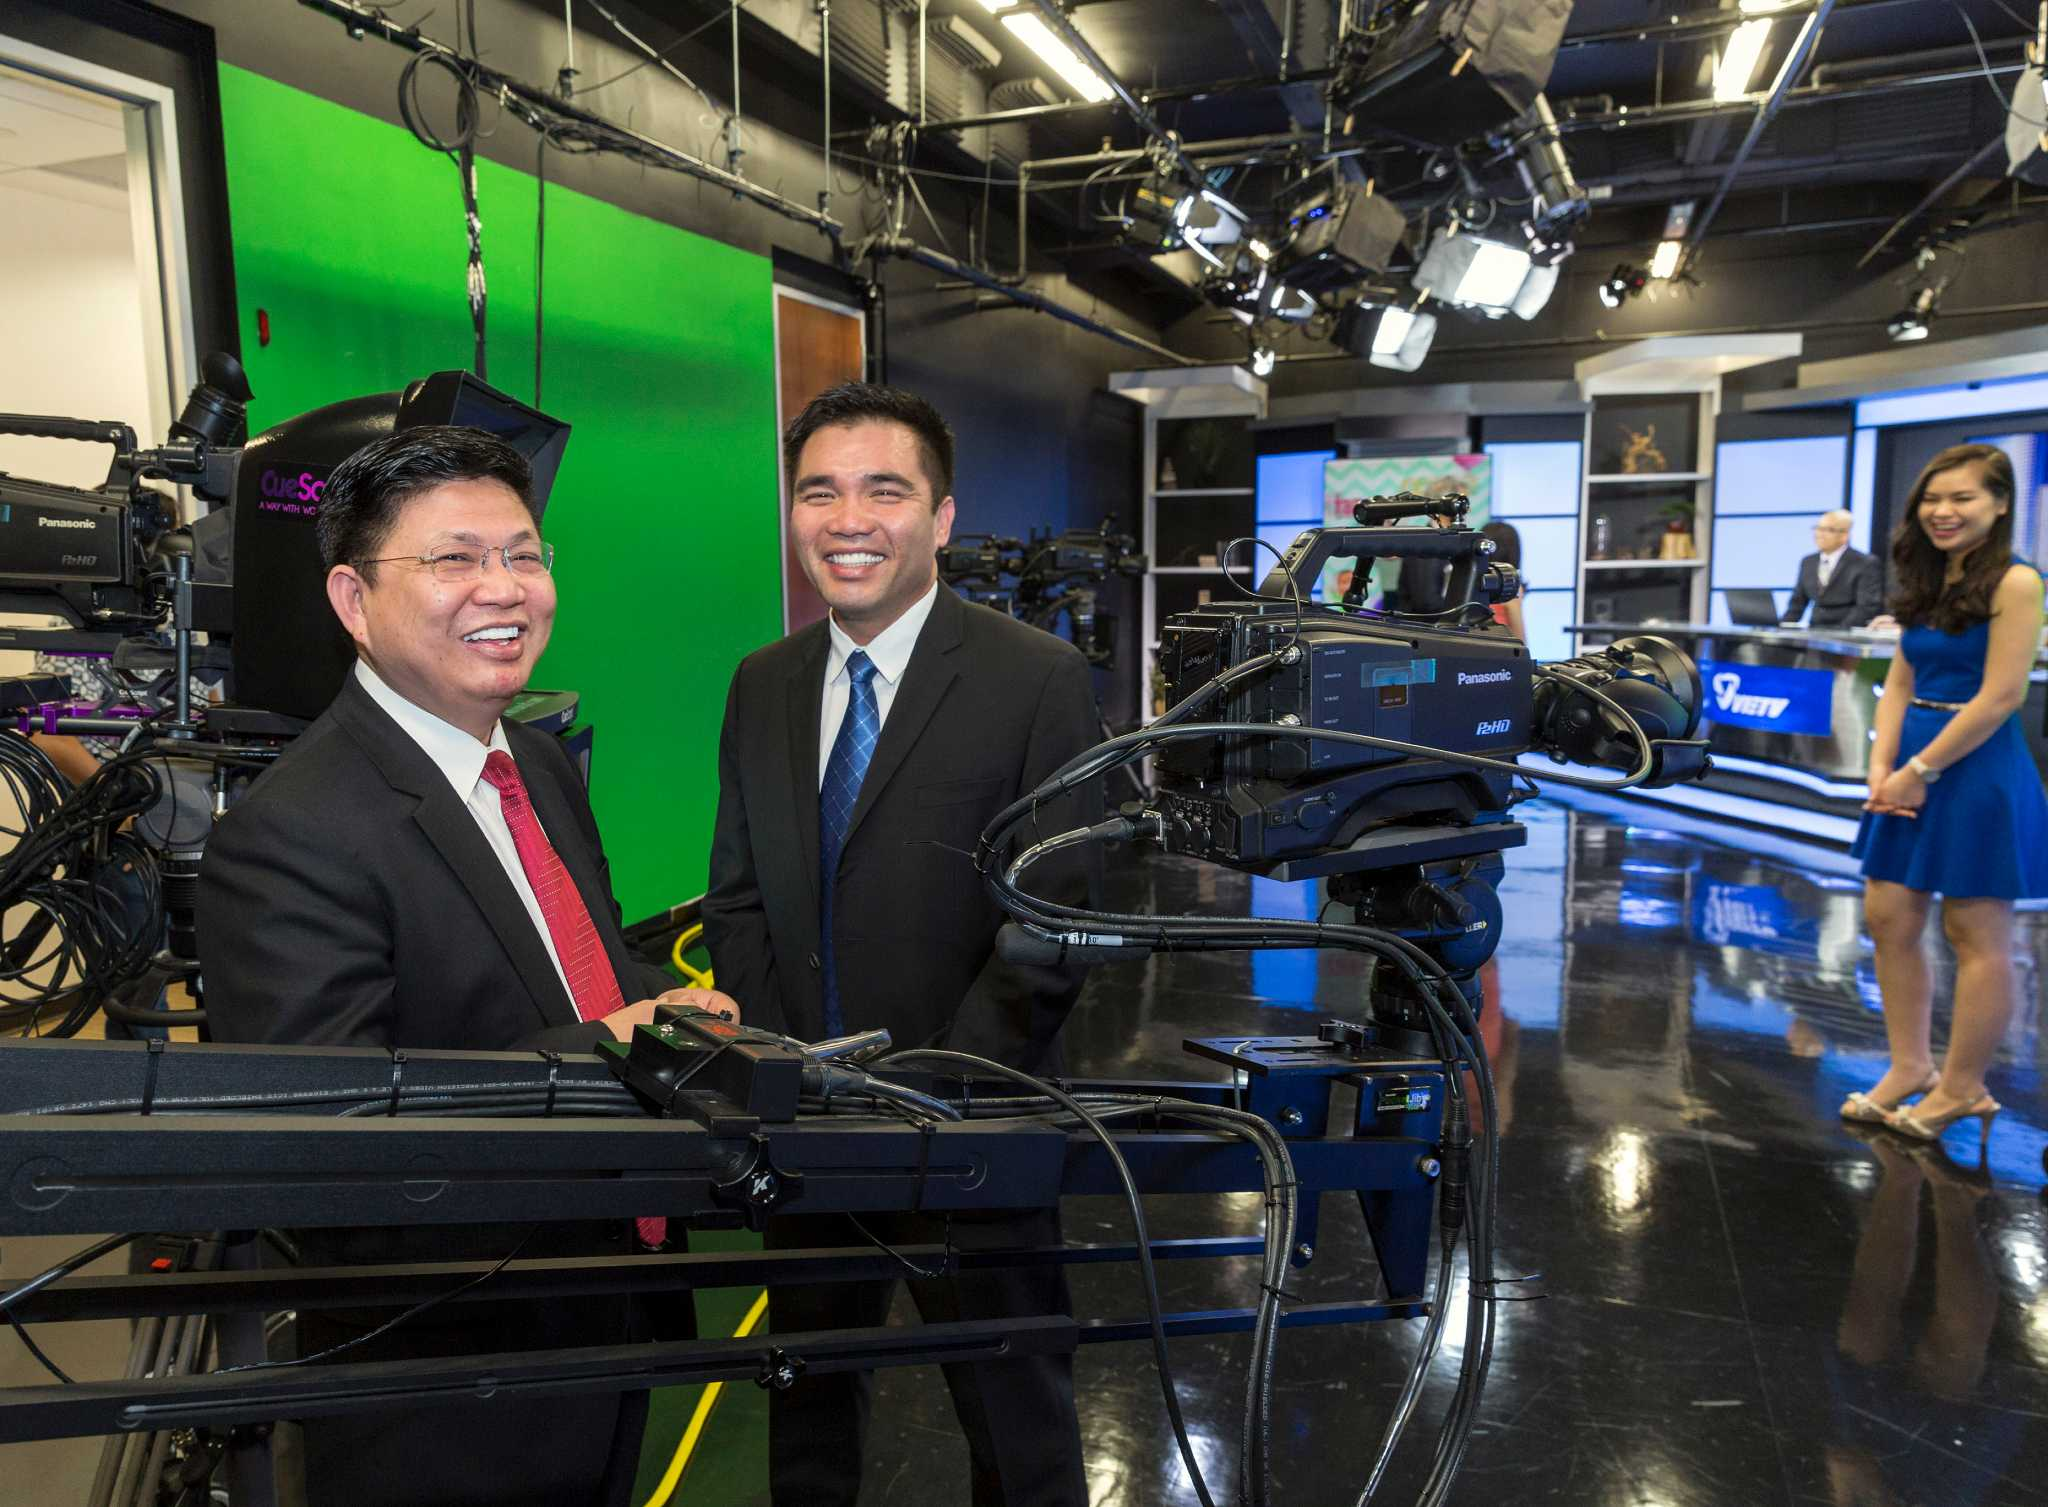 vietv  the houston-based vietnamese language tv network  keeps expanding